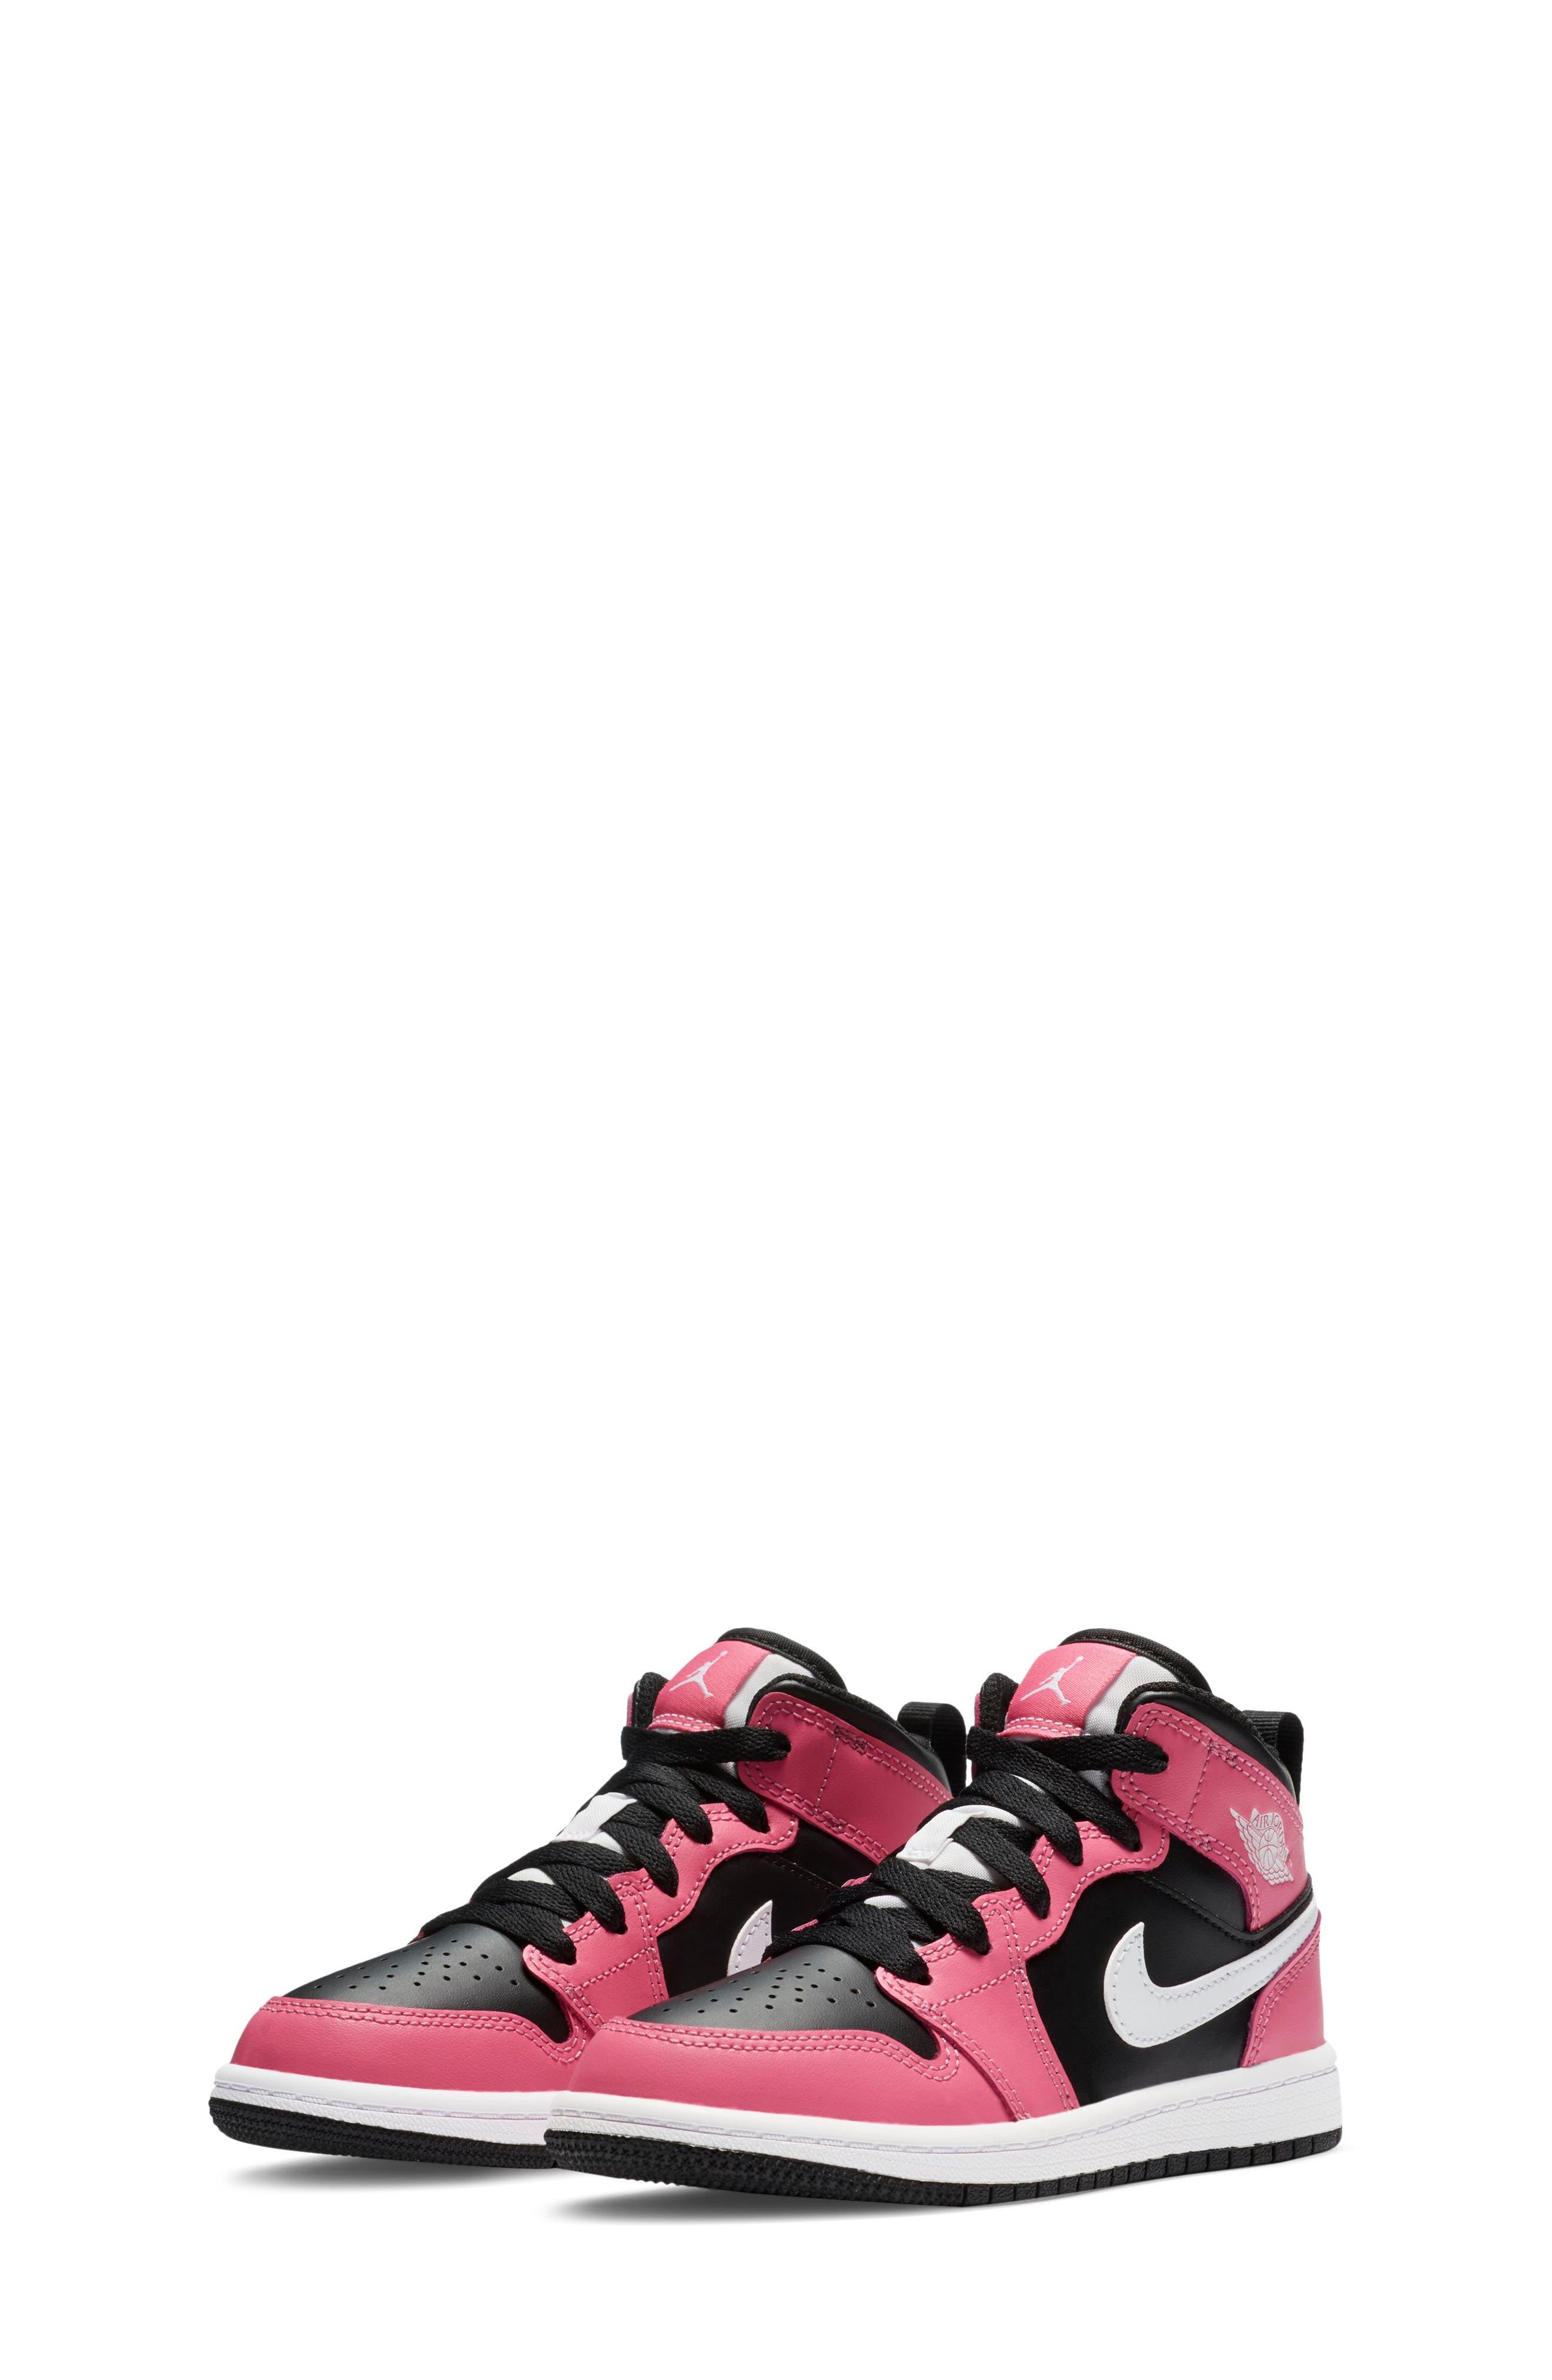 Unisex Baby Jordan \u0026 Walker Shoes